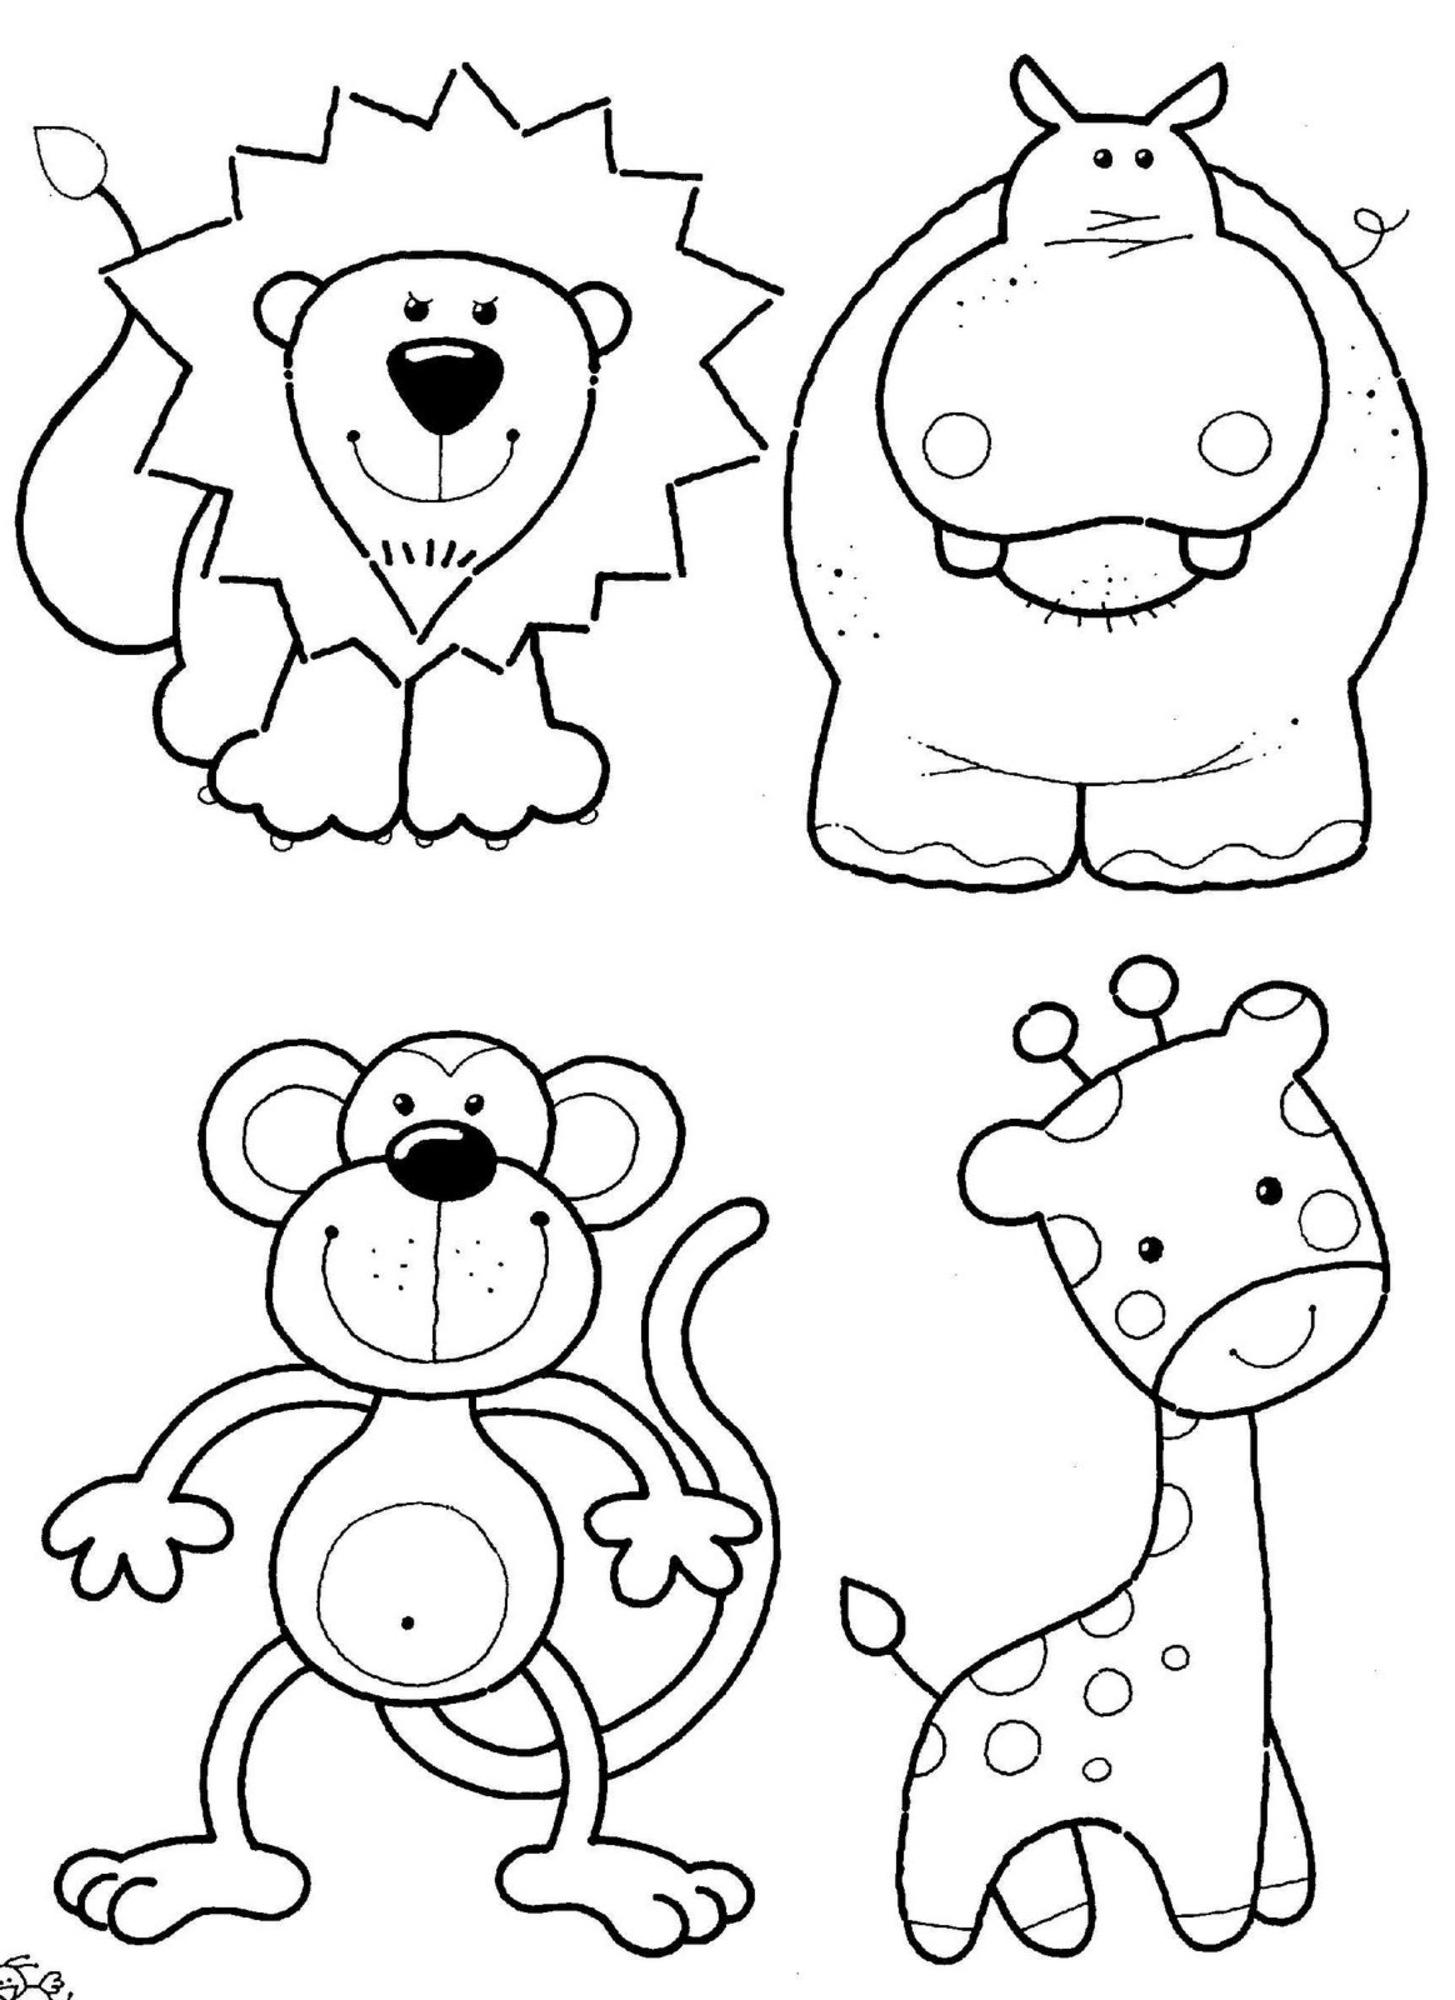 colouring sheets animals coloring lab sheets animals colouring